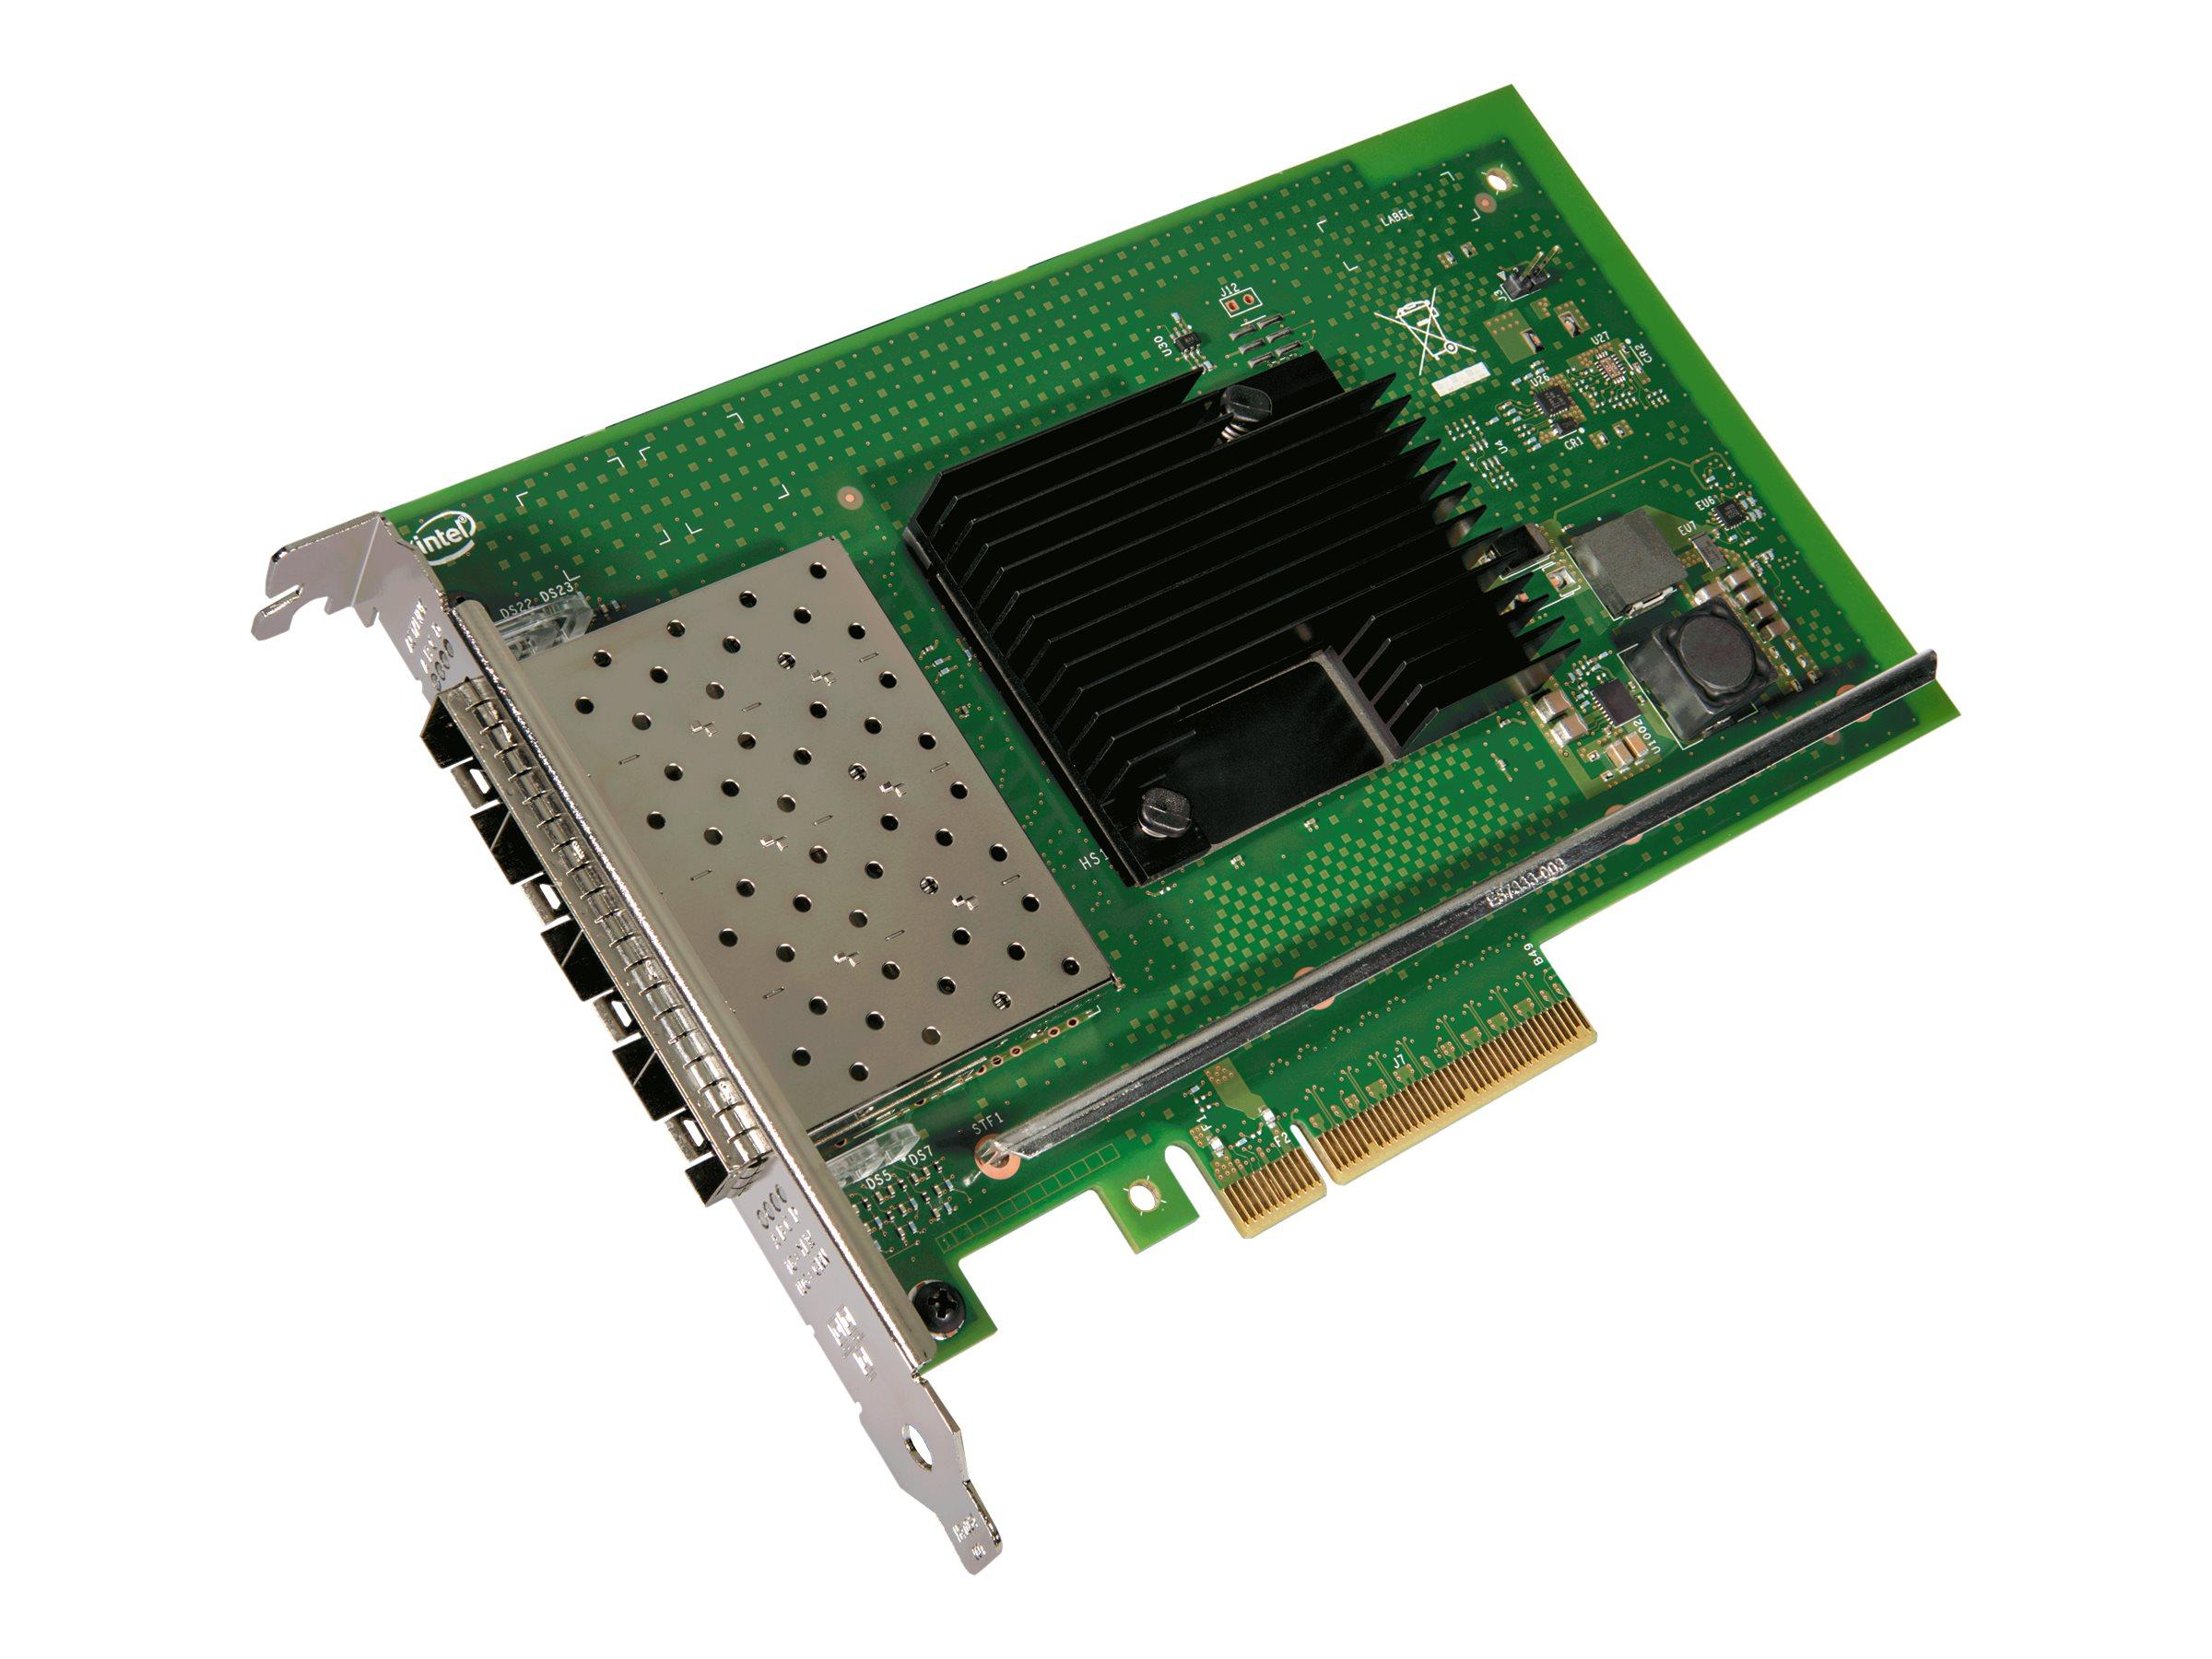 Intel Ethernet Converged Network Adapter X710-DA4 - Netzwerkadapter - PCIe 3.0 x8 Low-Profile - 10 Gigabit SFP+ x 4